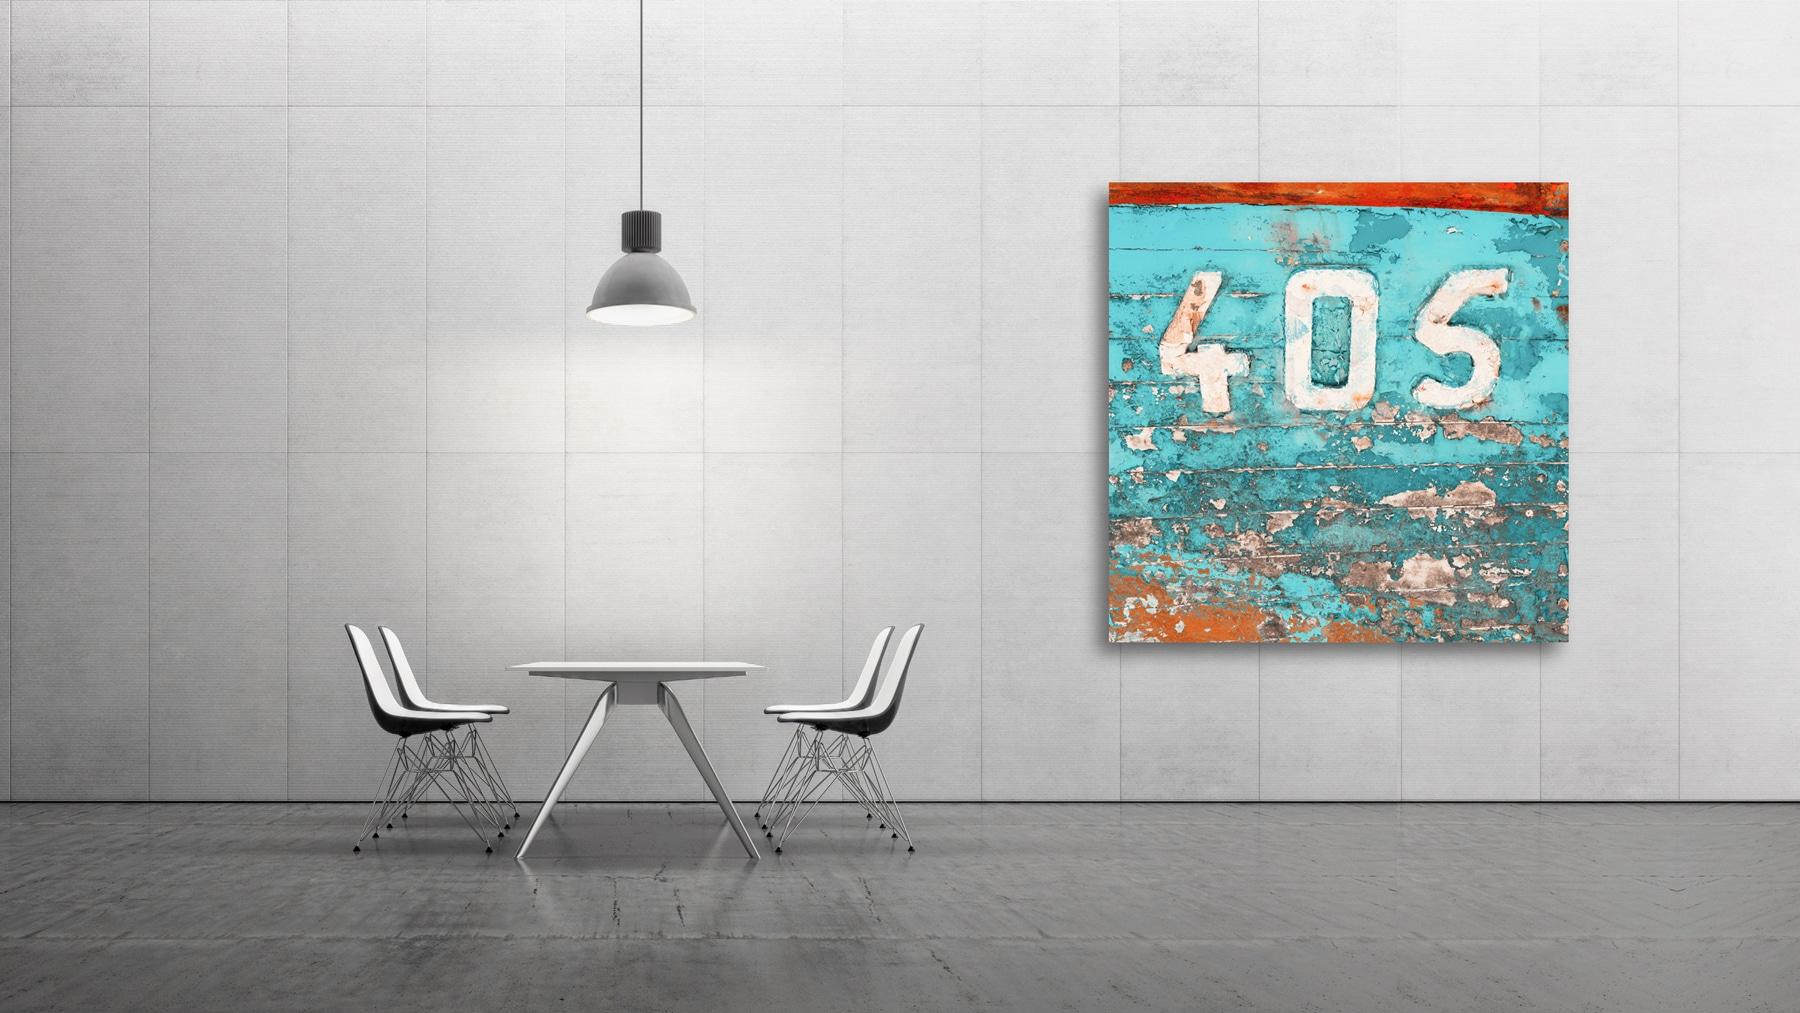 Fine-Art 405, Farbe Blau Rot, unlimted Edition